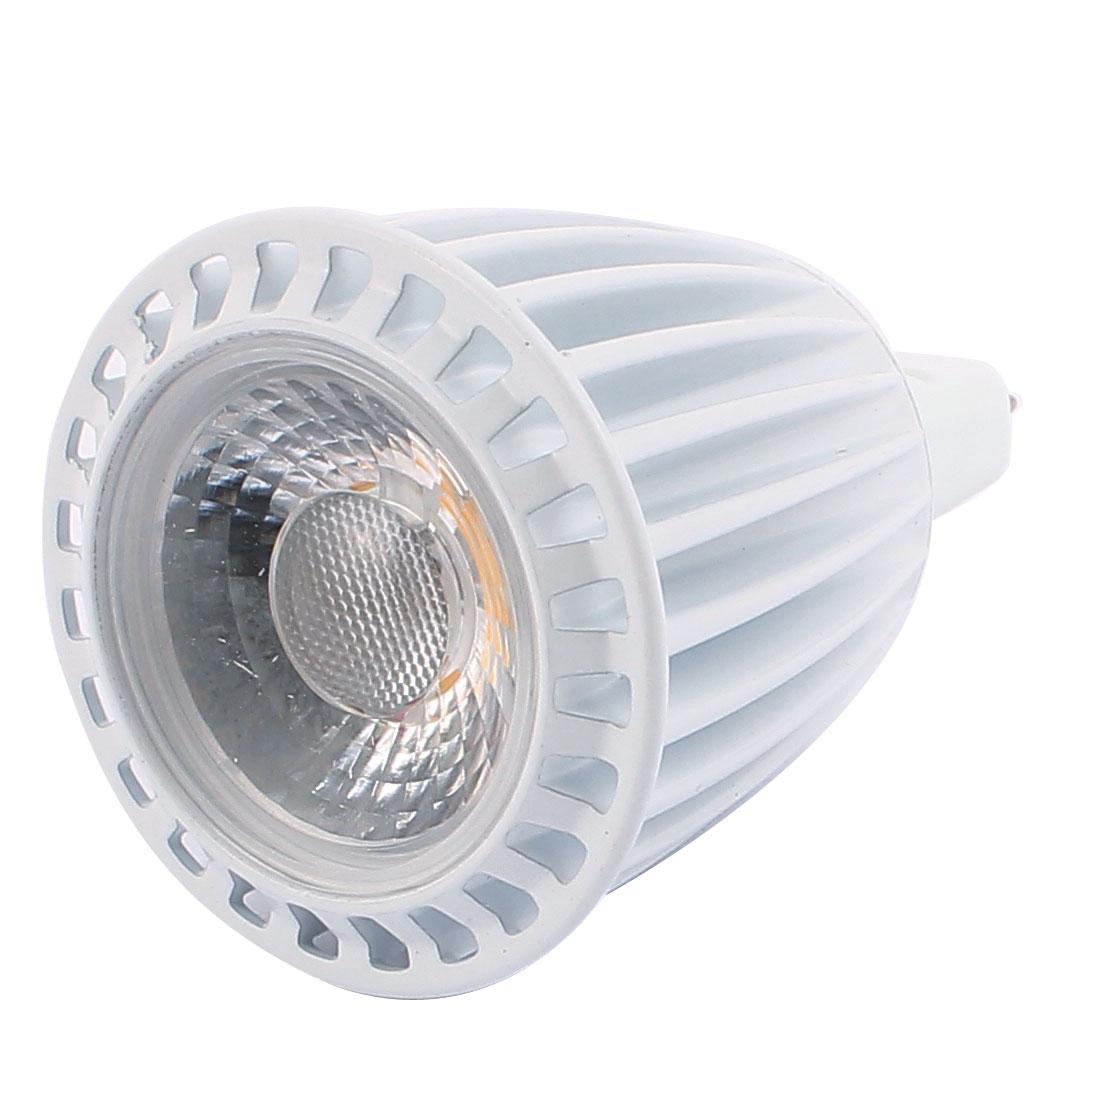 DC12V 7W Ultra Bright MR16 COB LED Spotlight Lamp Bulb Downlight Warm White